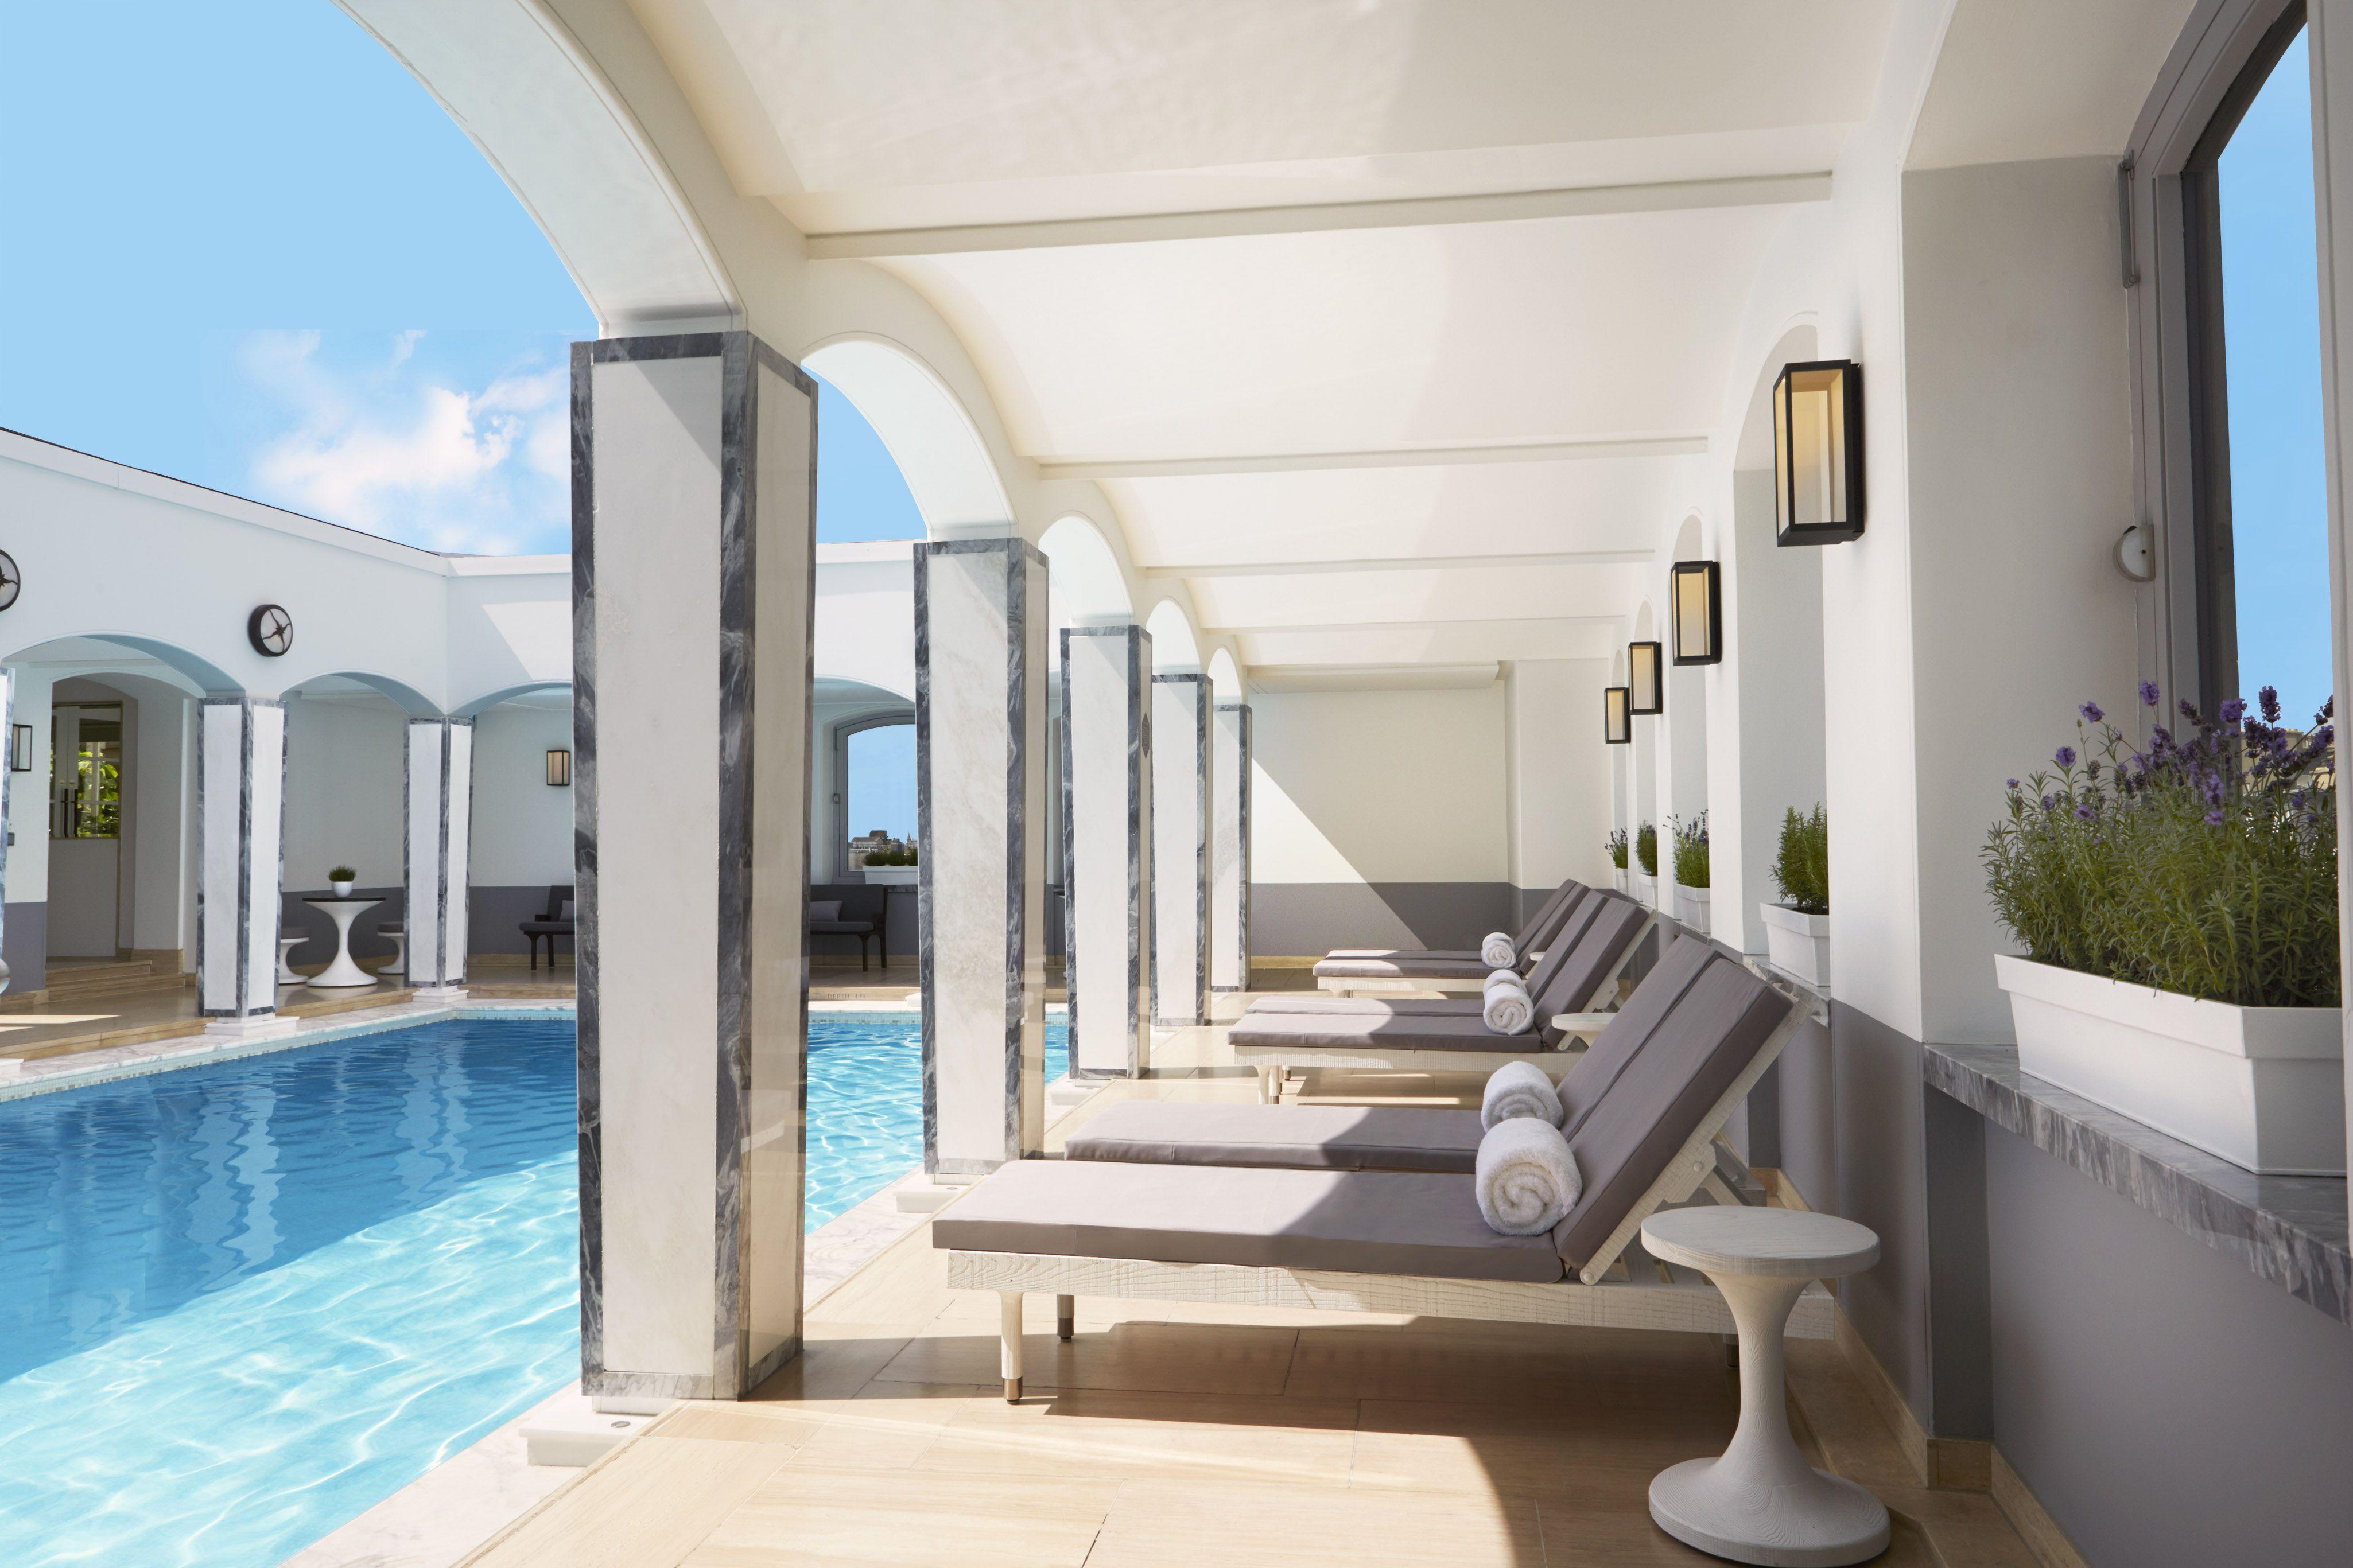 The Berkeley Hotel Pool